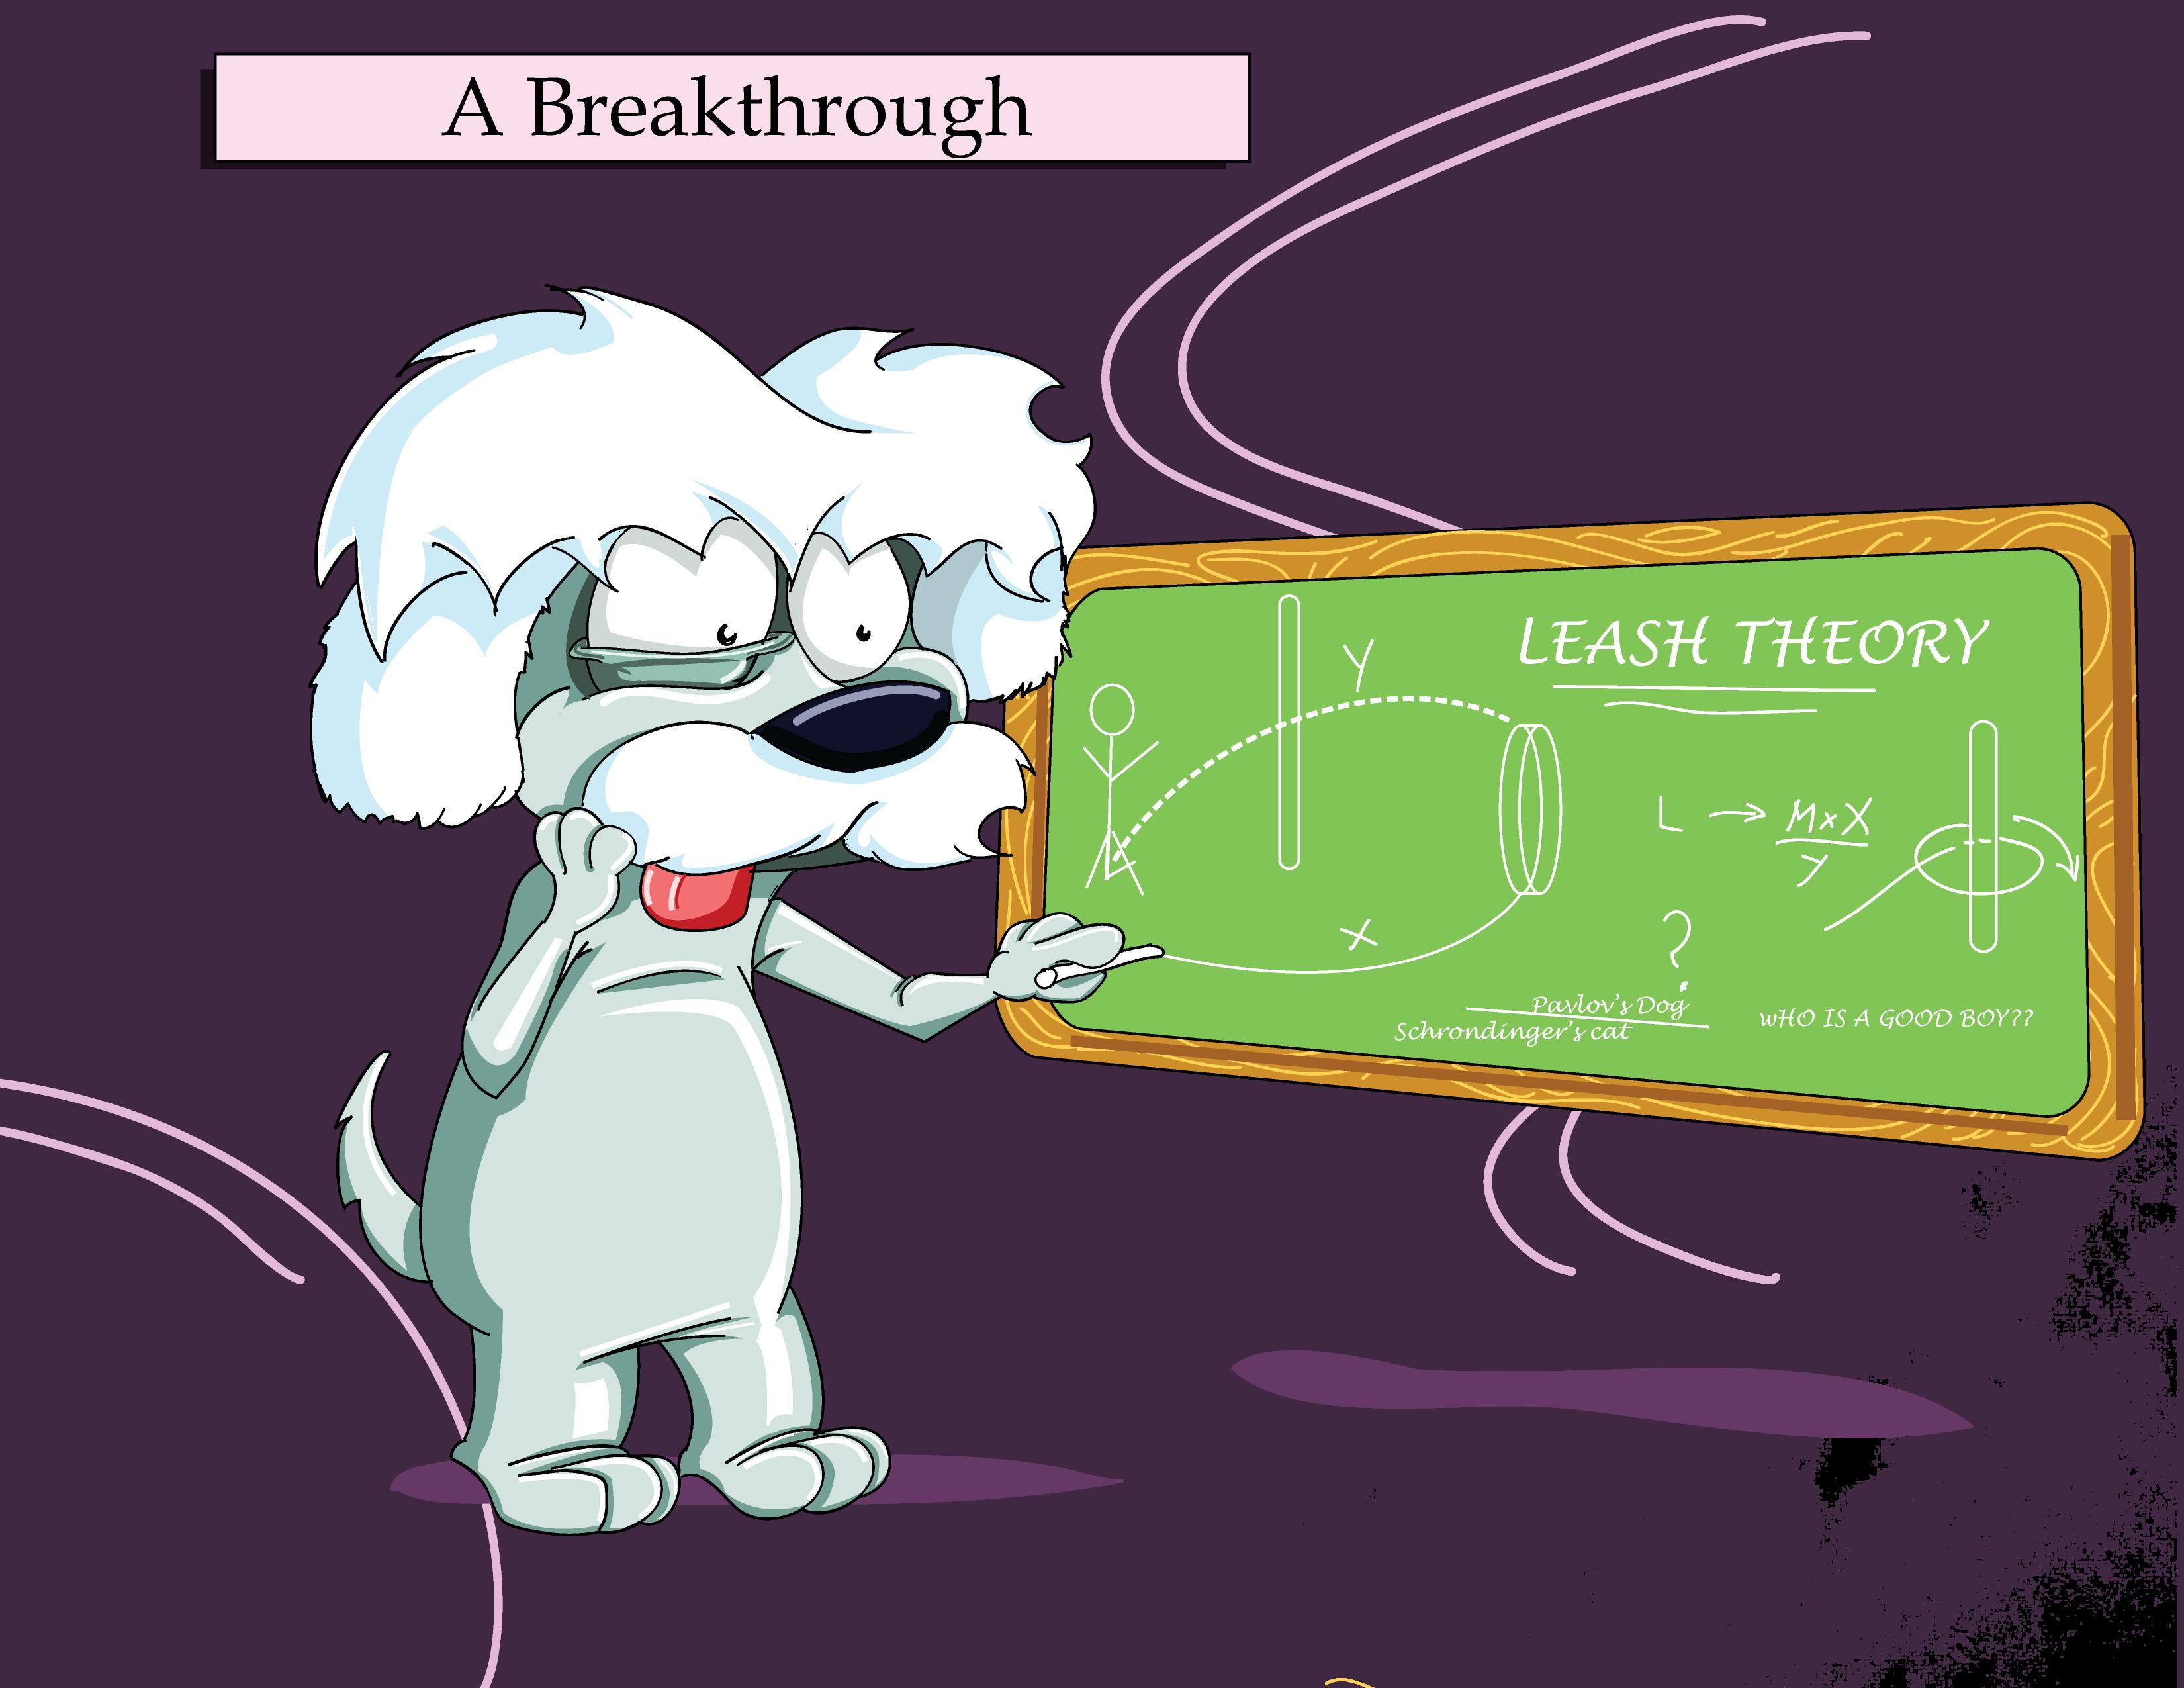 Leash Theory